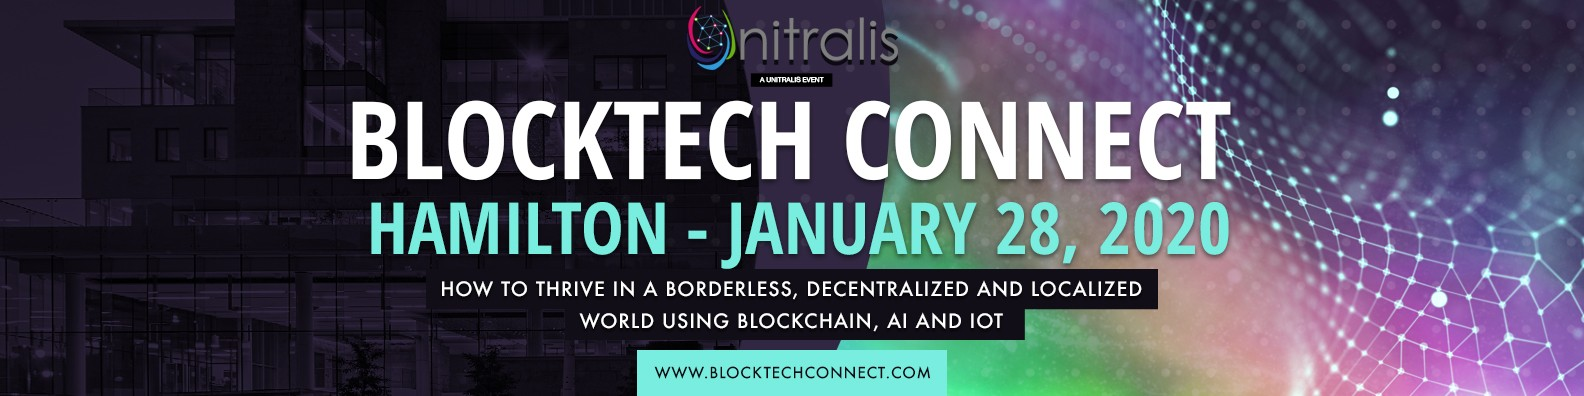 BLOCKTECH CONNECT